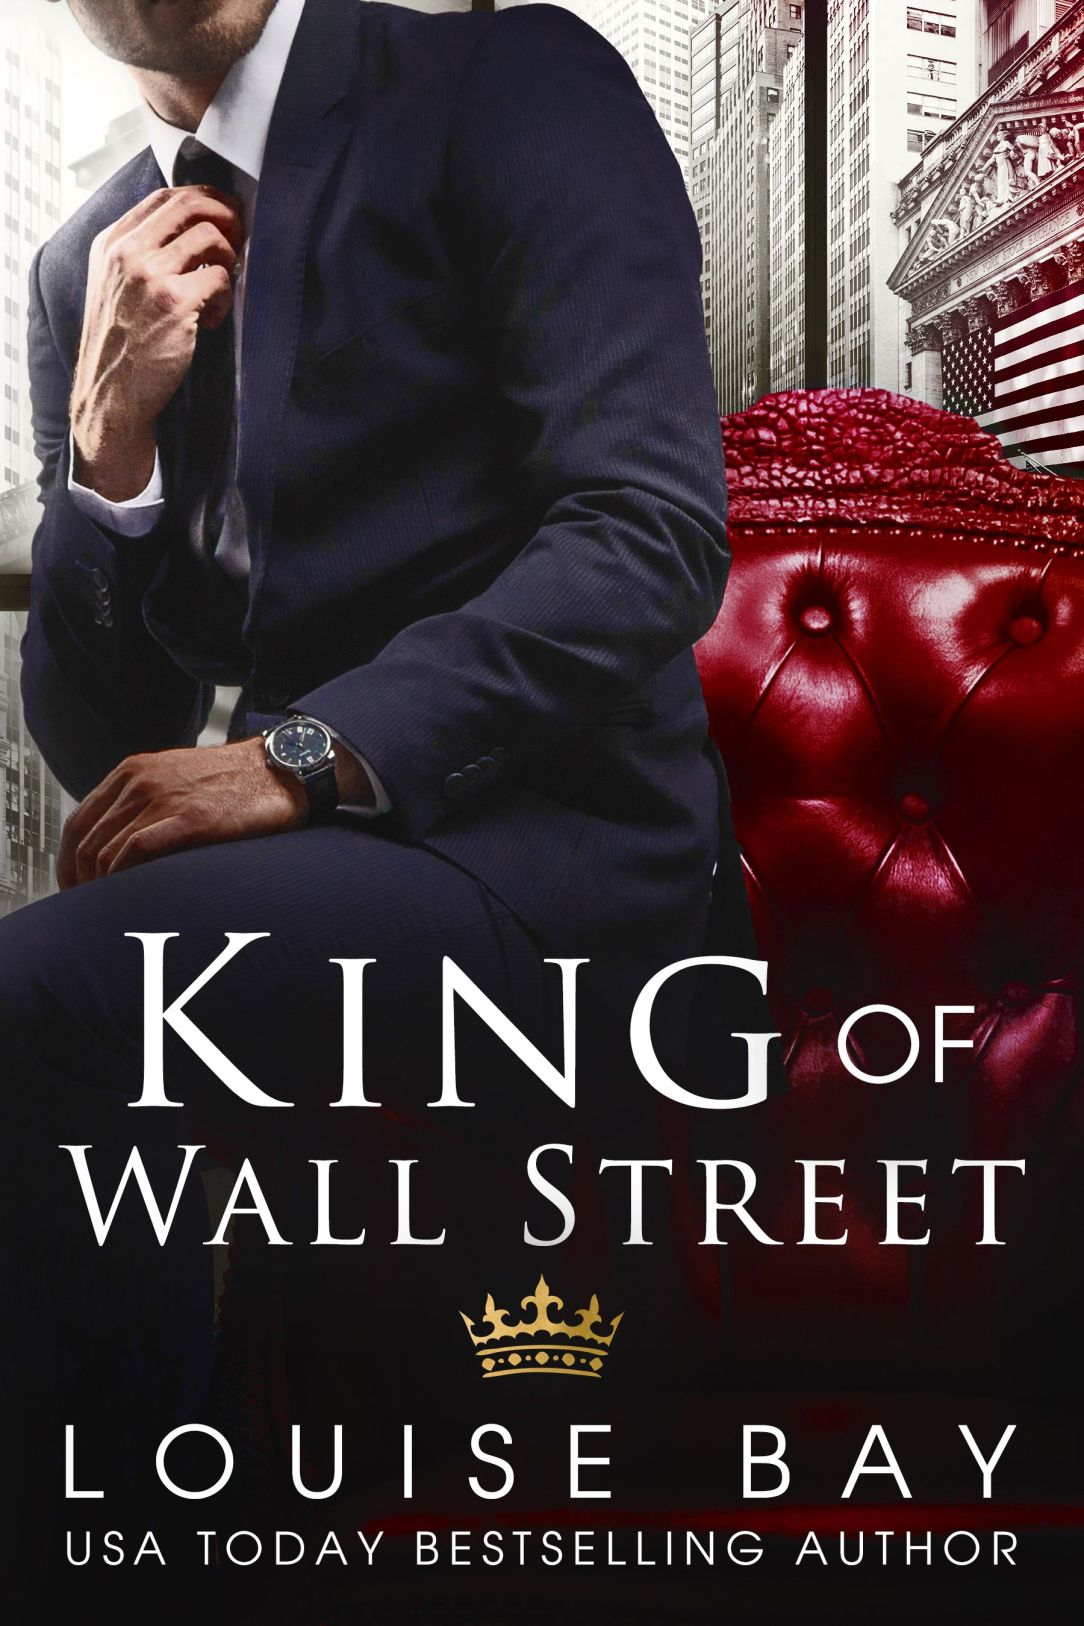 KingofWallStreet